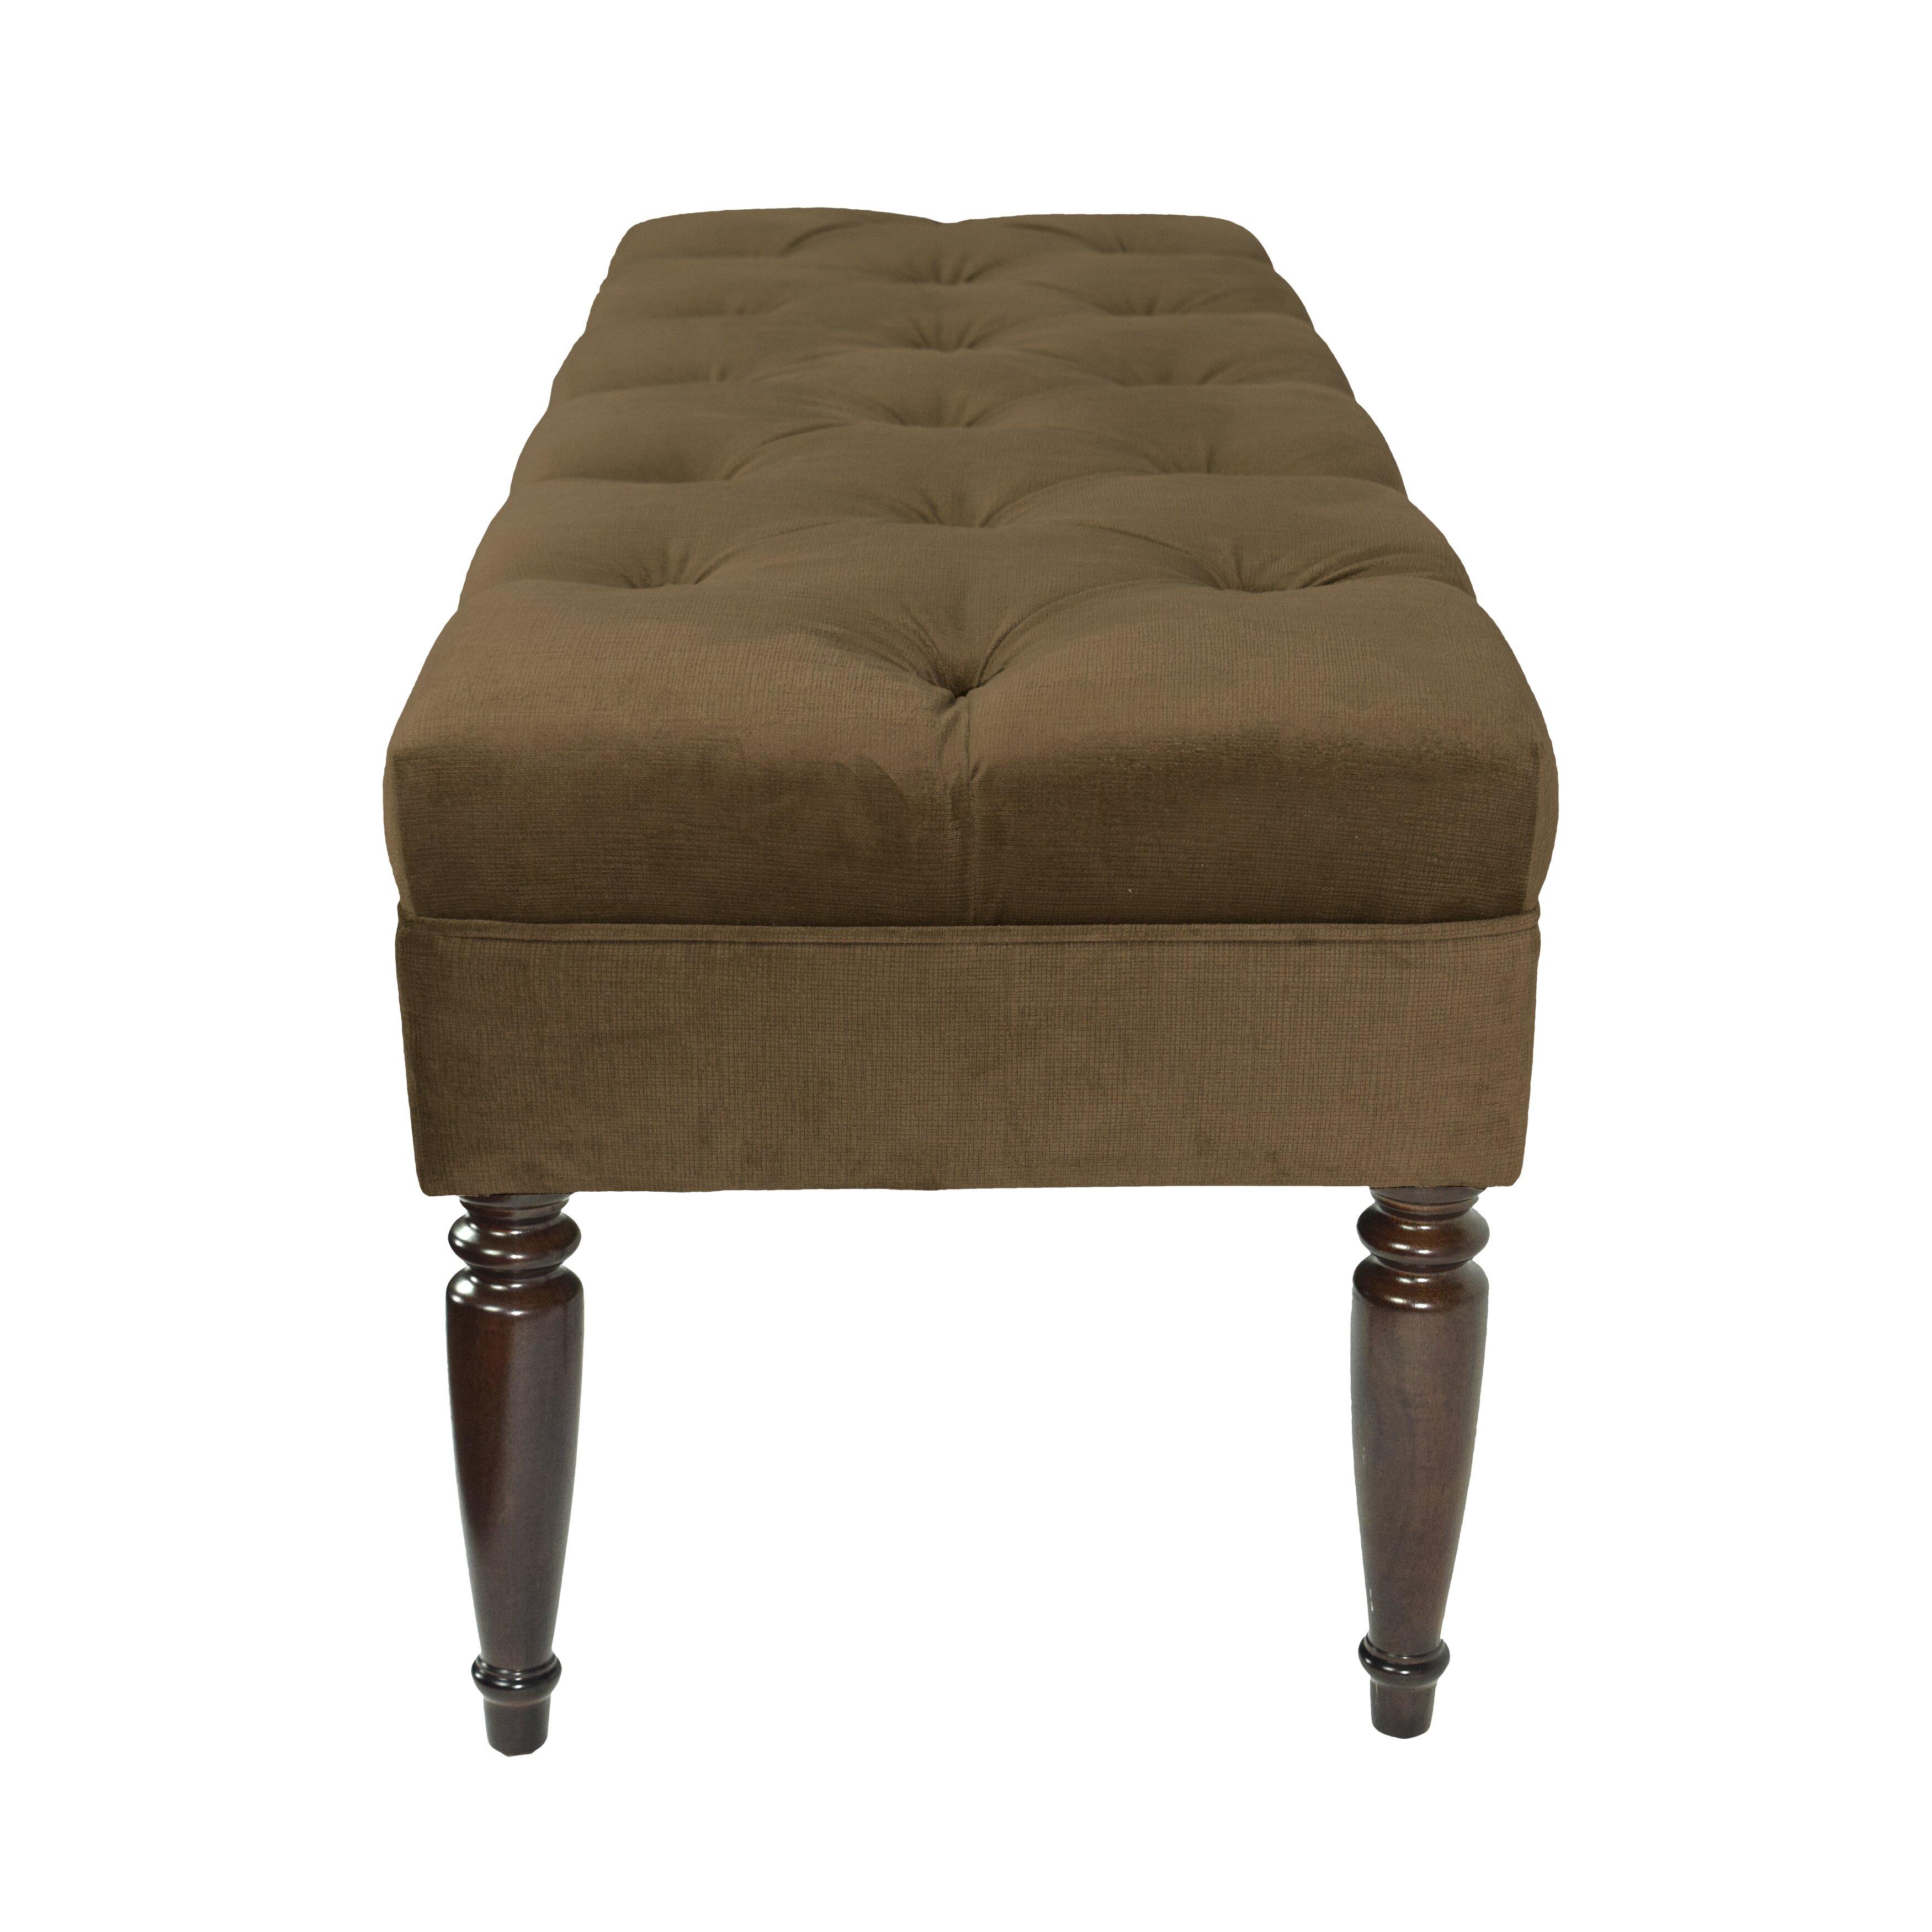 MJLFurniture Ennis Upholstered Bedroom Bench amp Reviews  : MJL Furniture Ennis Upholstered Bedroom Bench from www.wayfair.ca size 3500 x 3500 jpeg 978kB